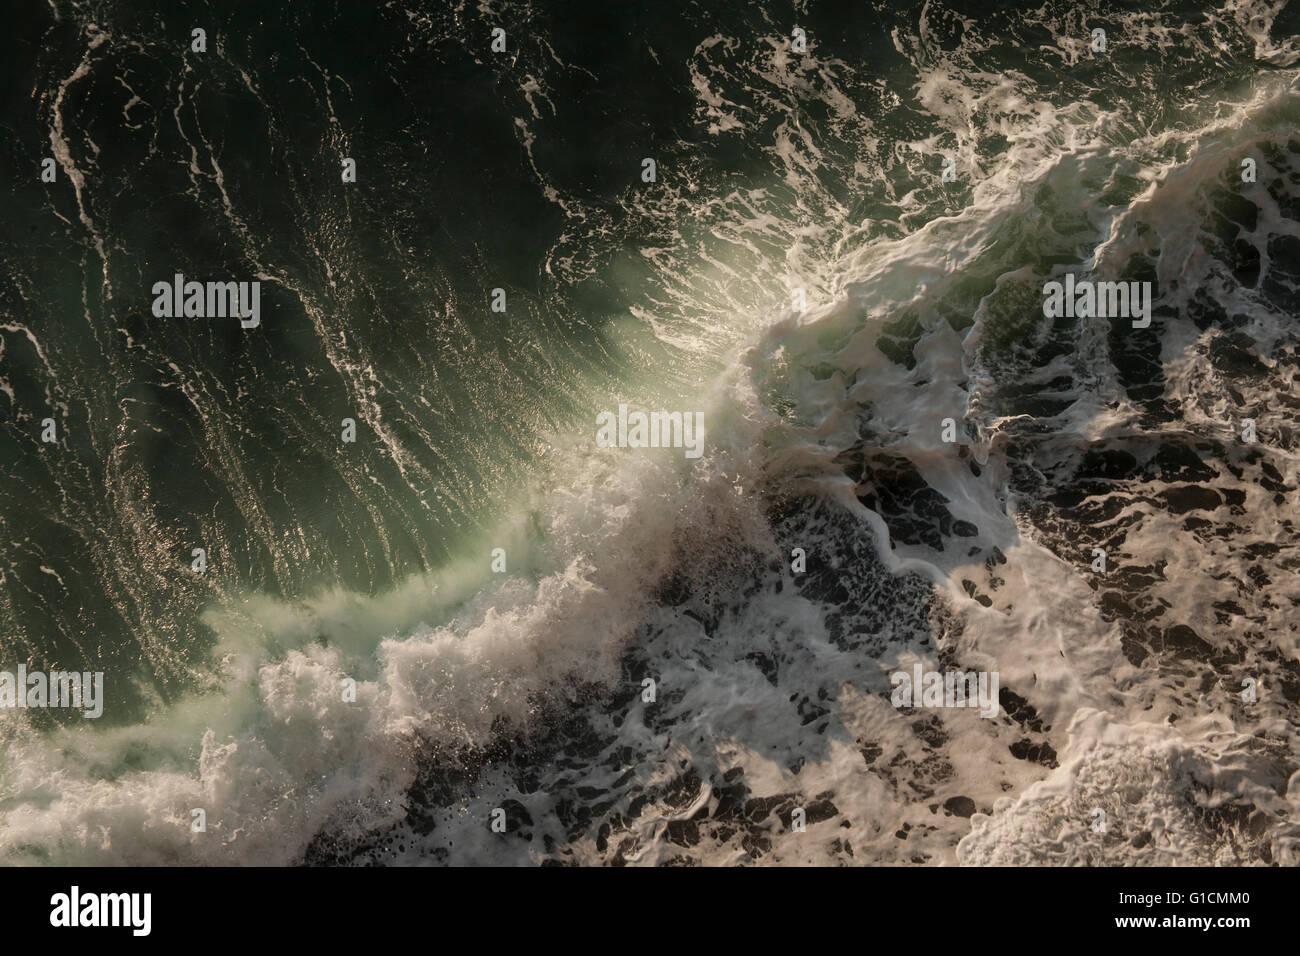 Brechen der Welle, Satsuma-Halbinsel, Insel Kyushu, Japan Stockbild